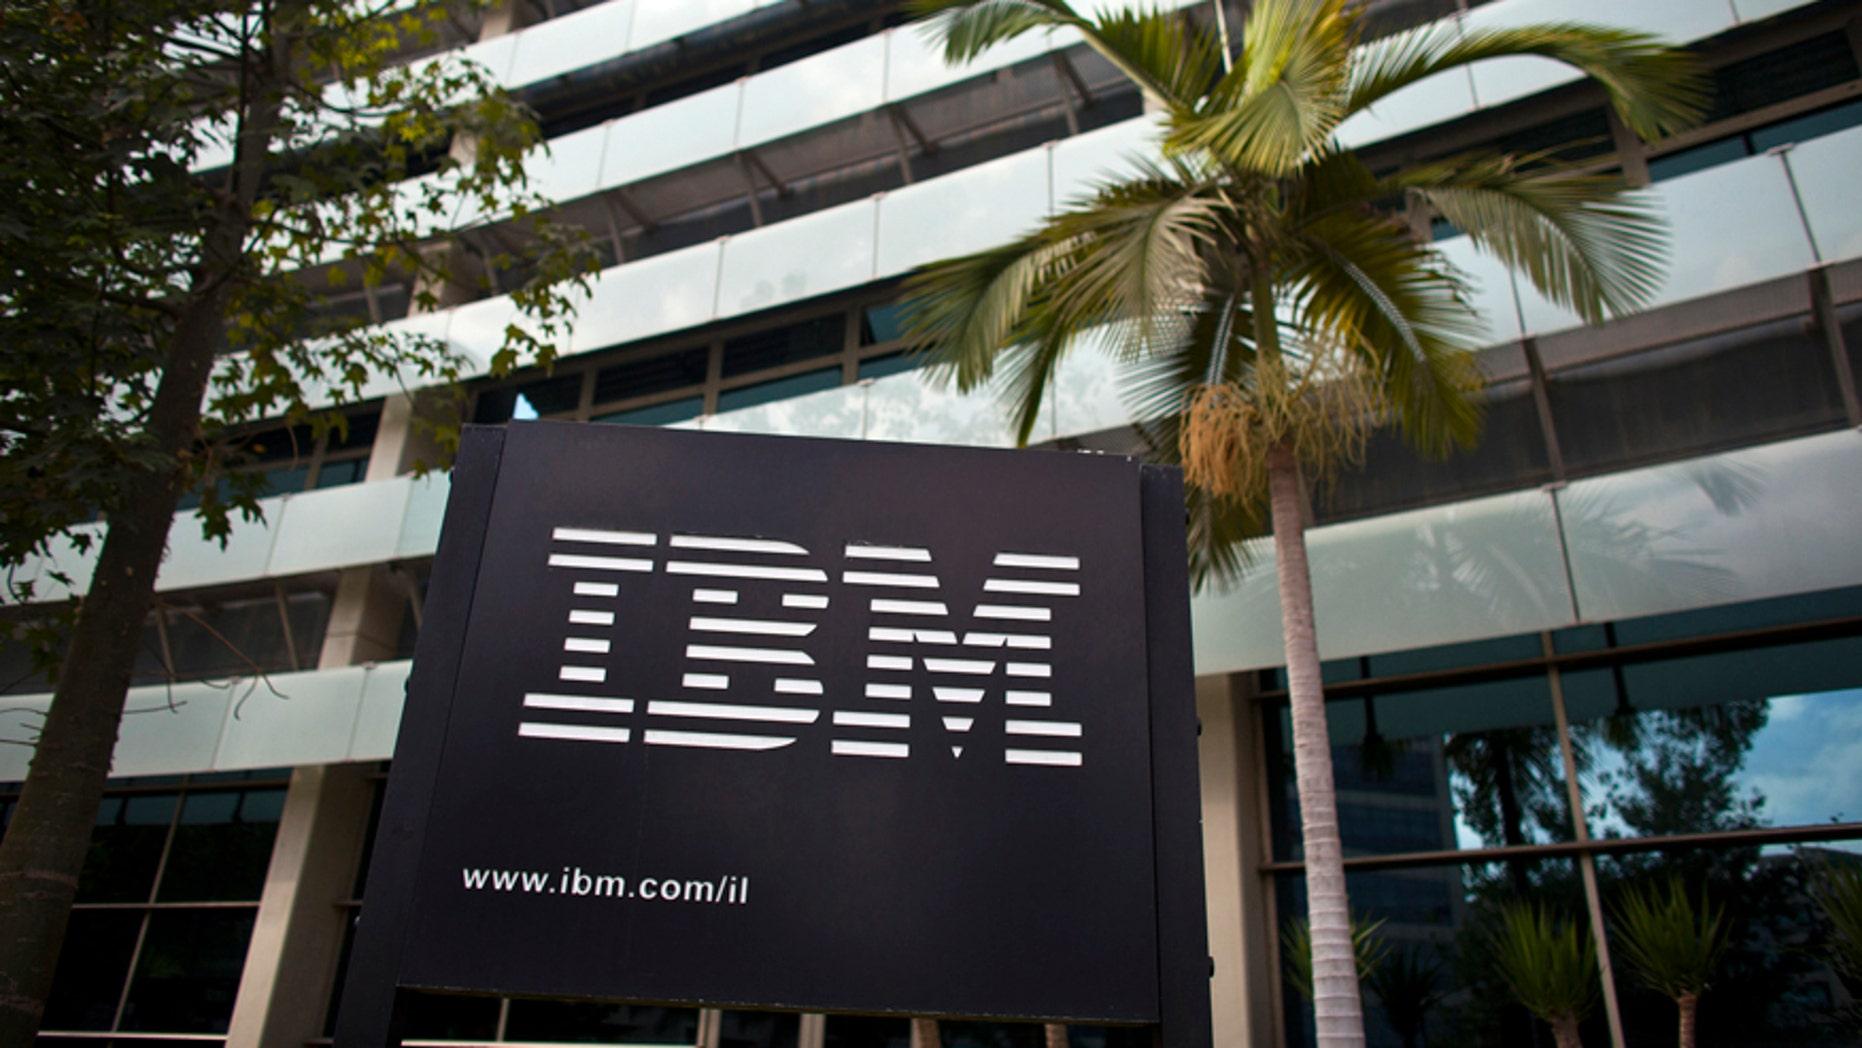 File photo The IBM logo is